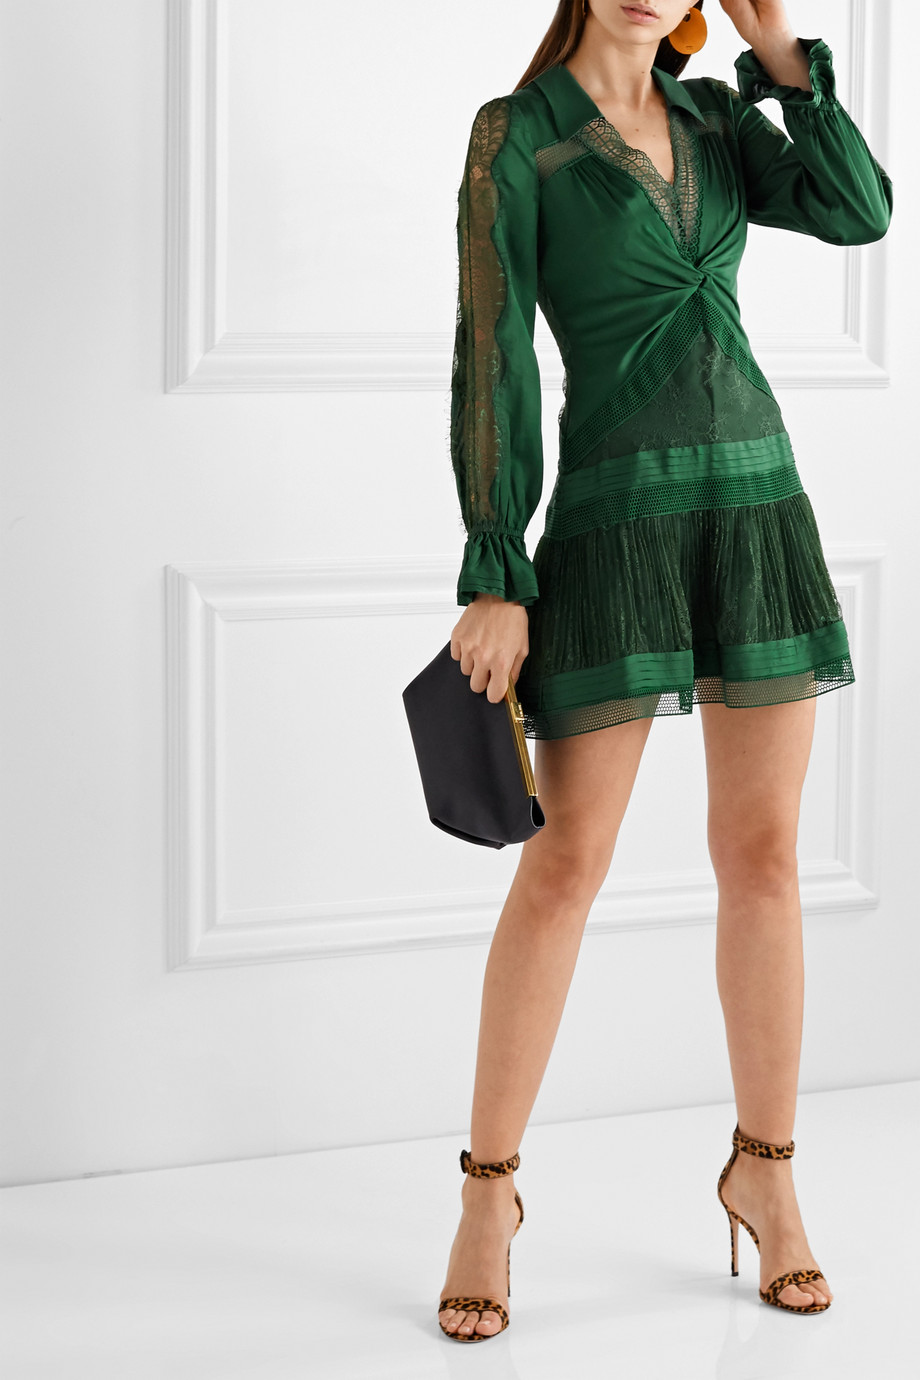 Self-Portrait Twist-front paneled satin-twill, lace and mesh mini dress